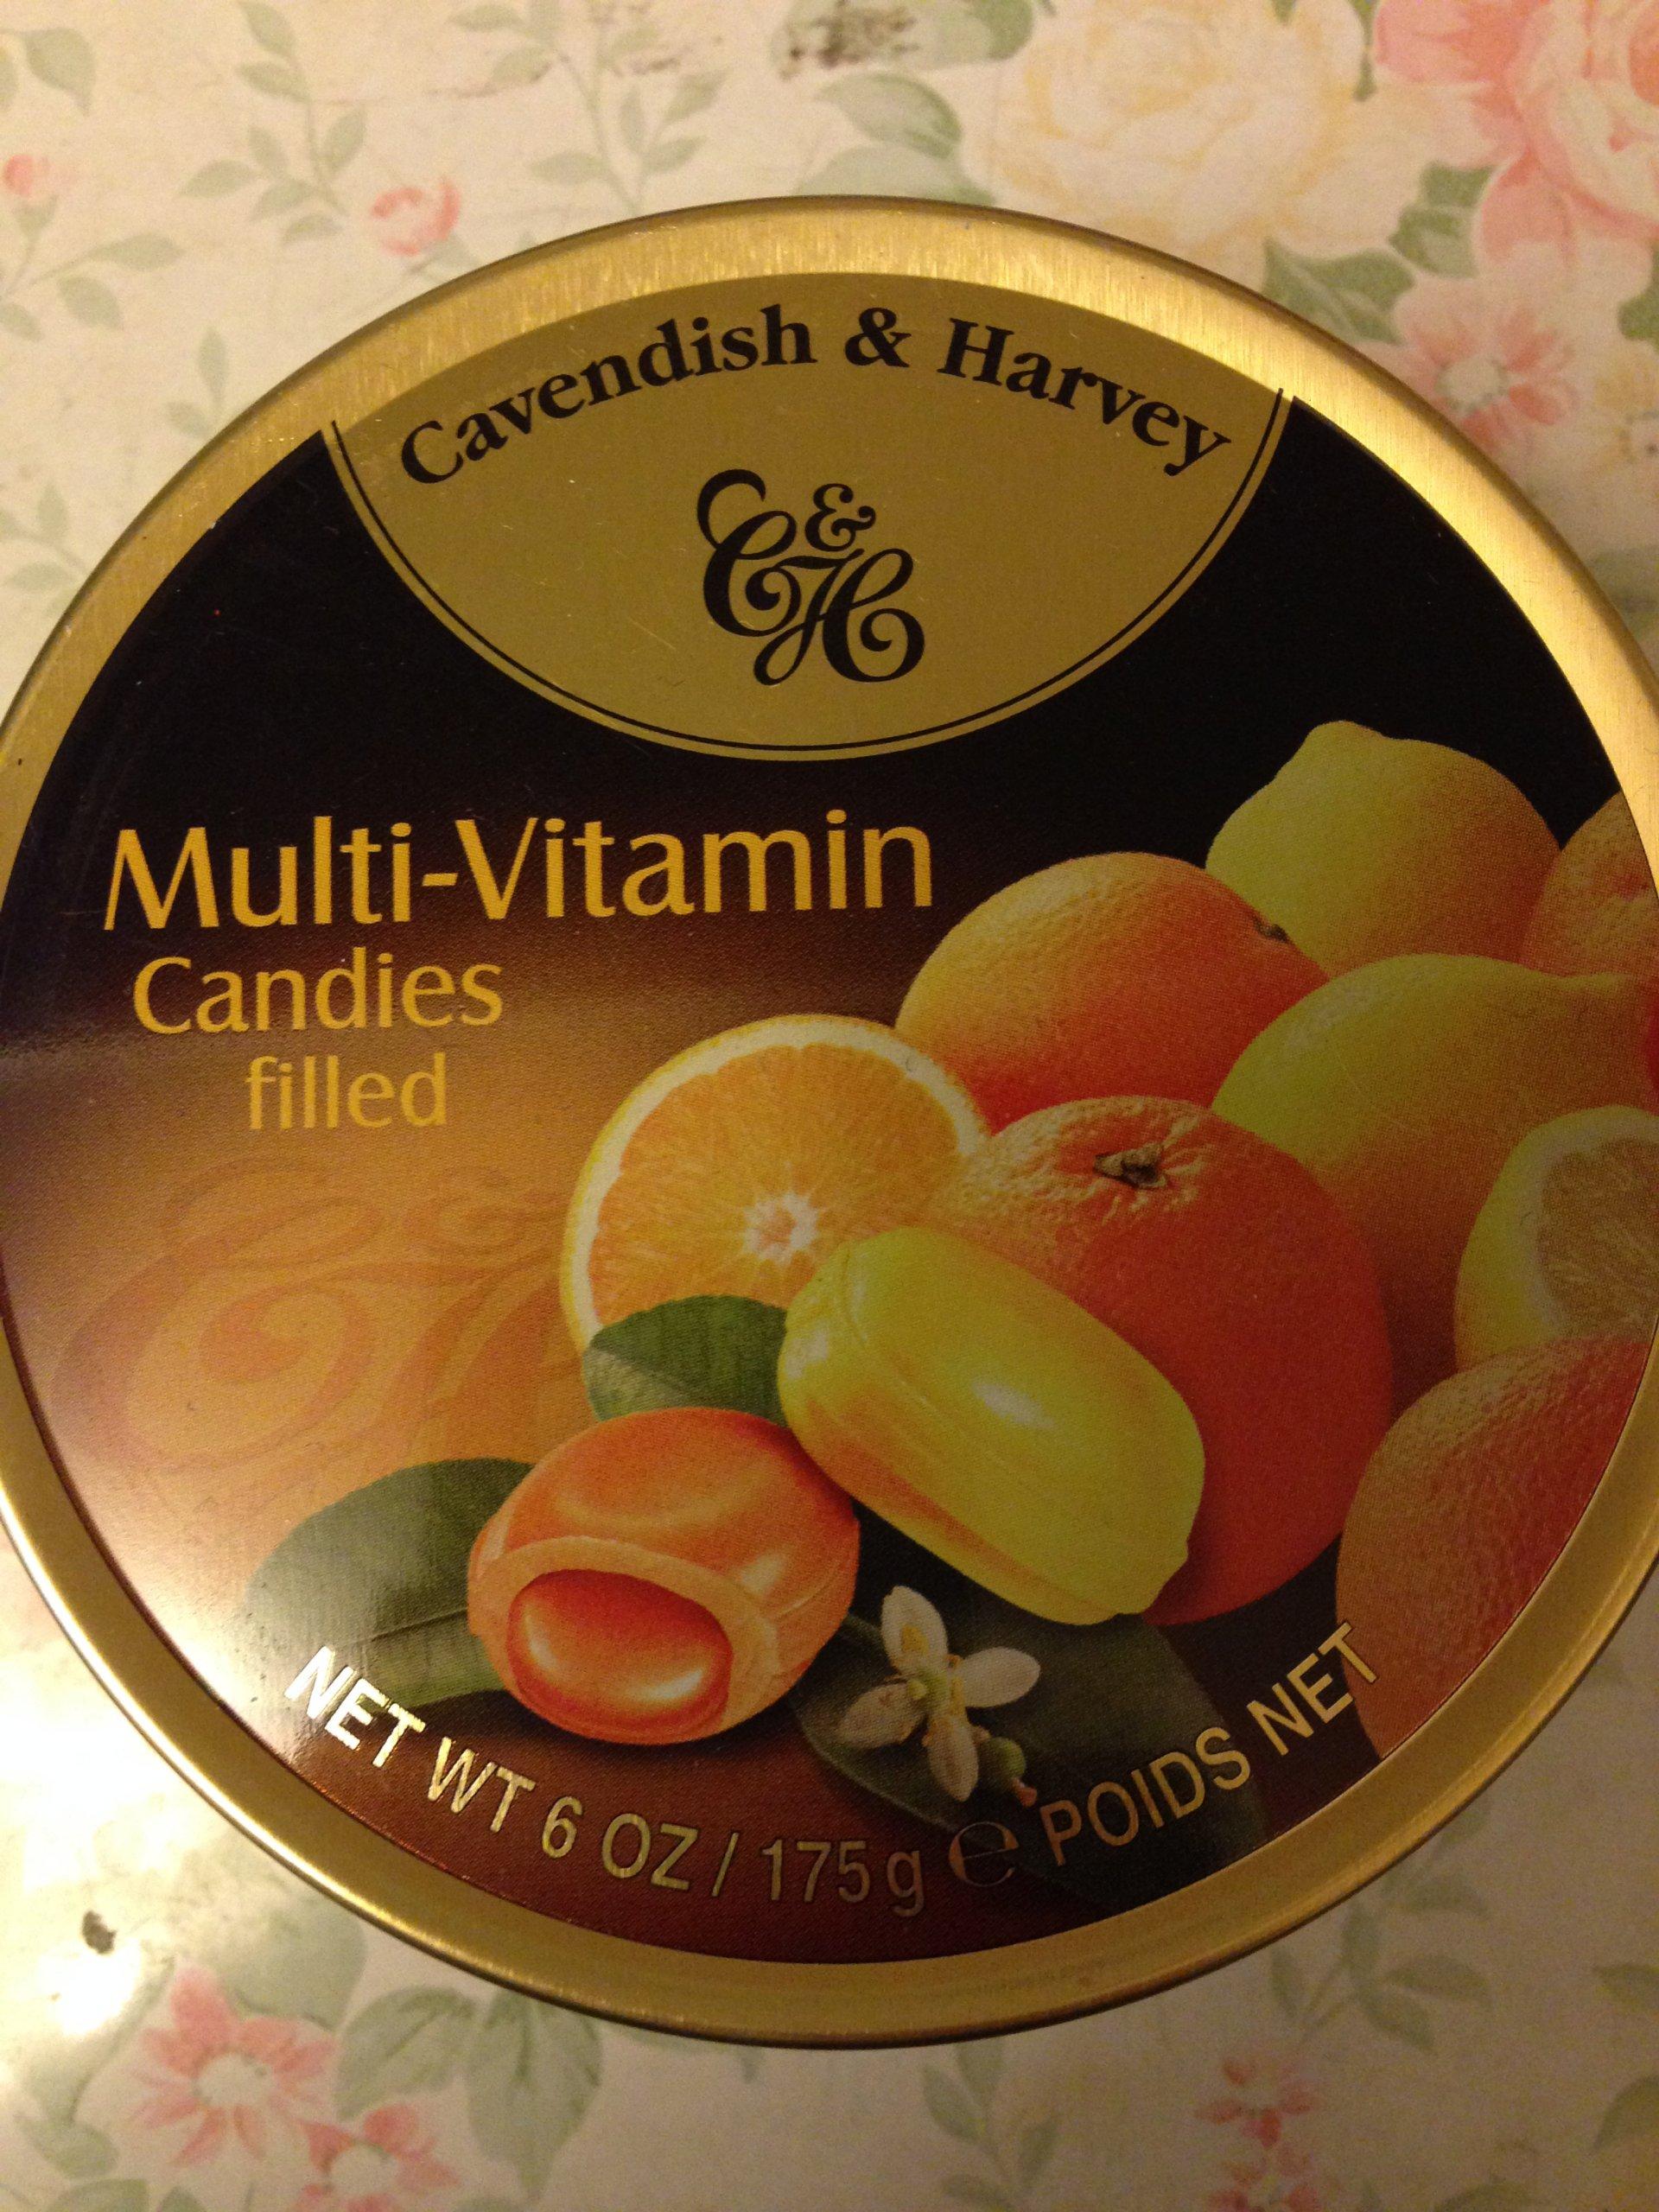 Cavendish & Harvey Multi-Vitamin Candies filled Drops 175g QUALITY BRITISH FOOD 0102